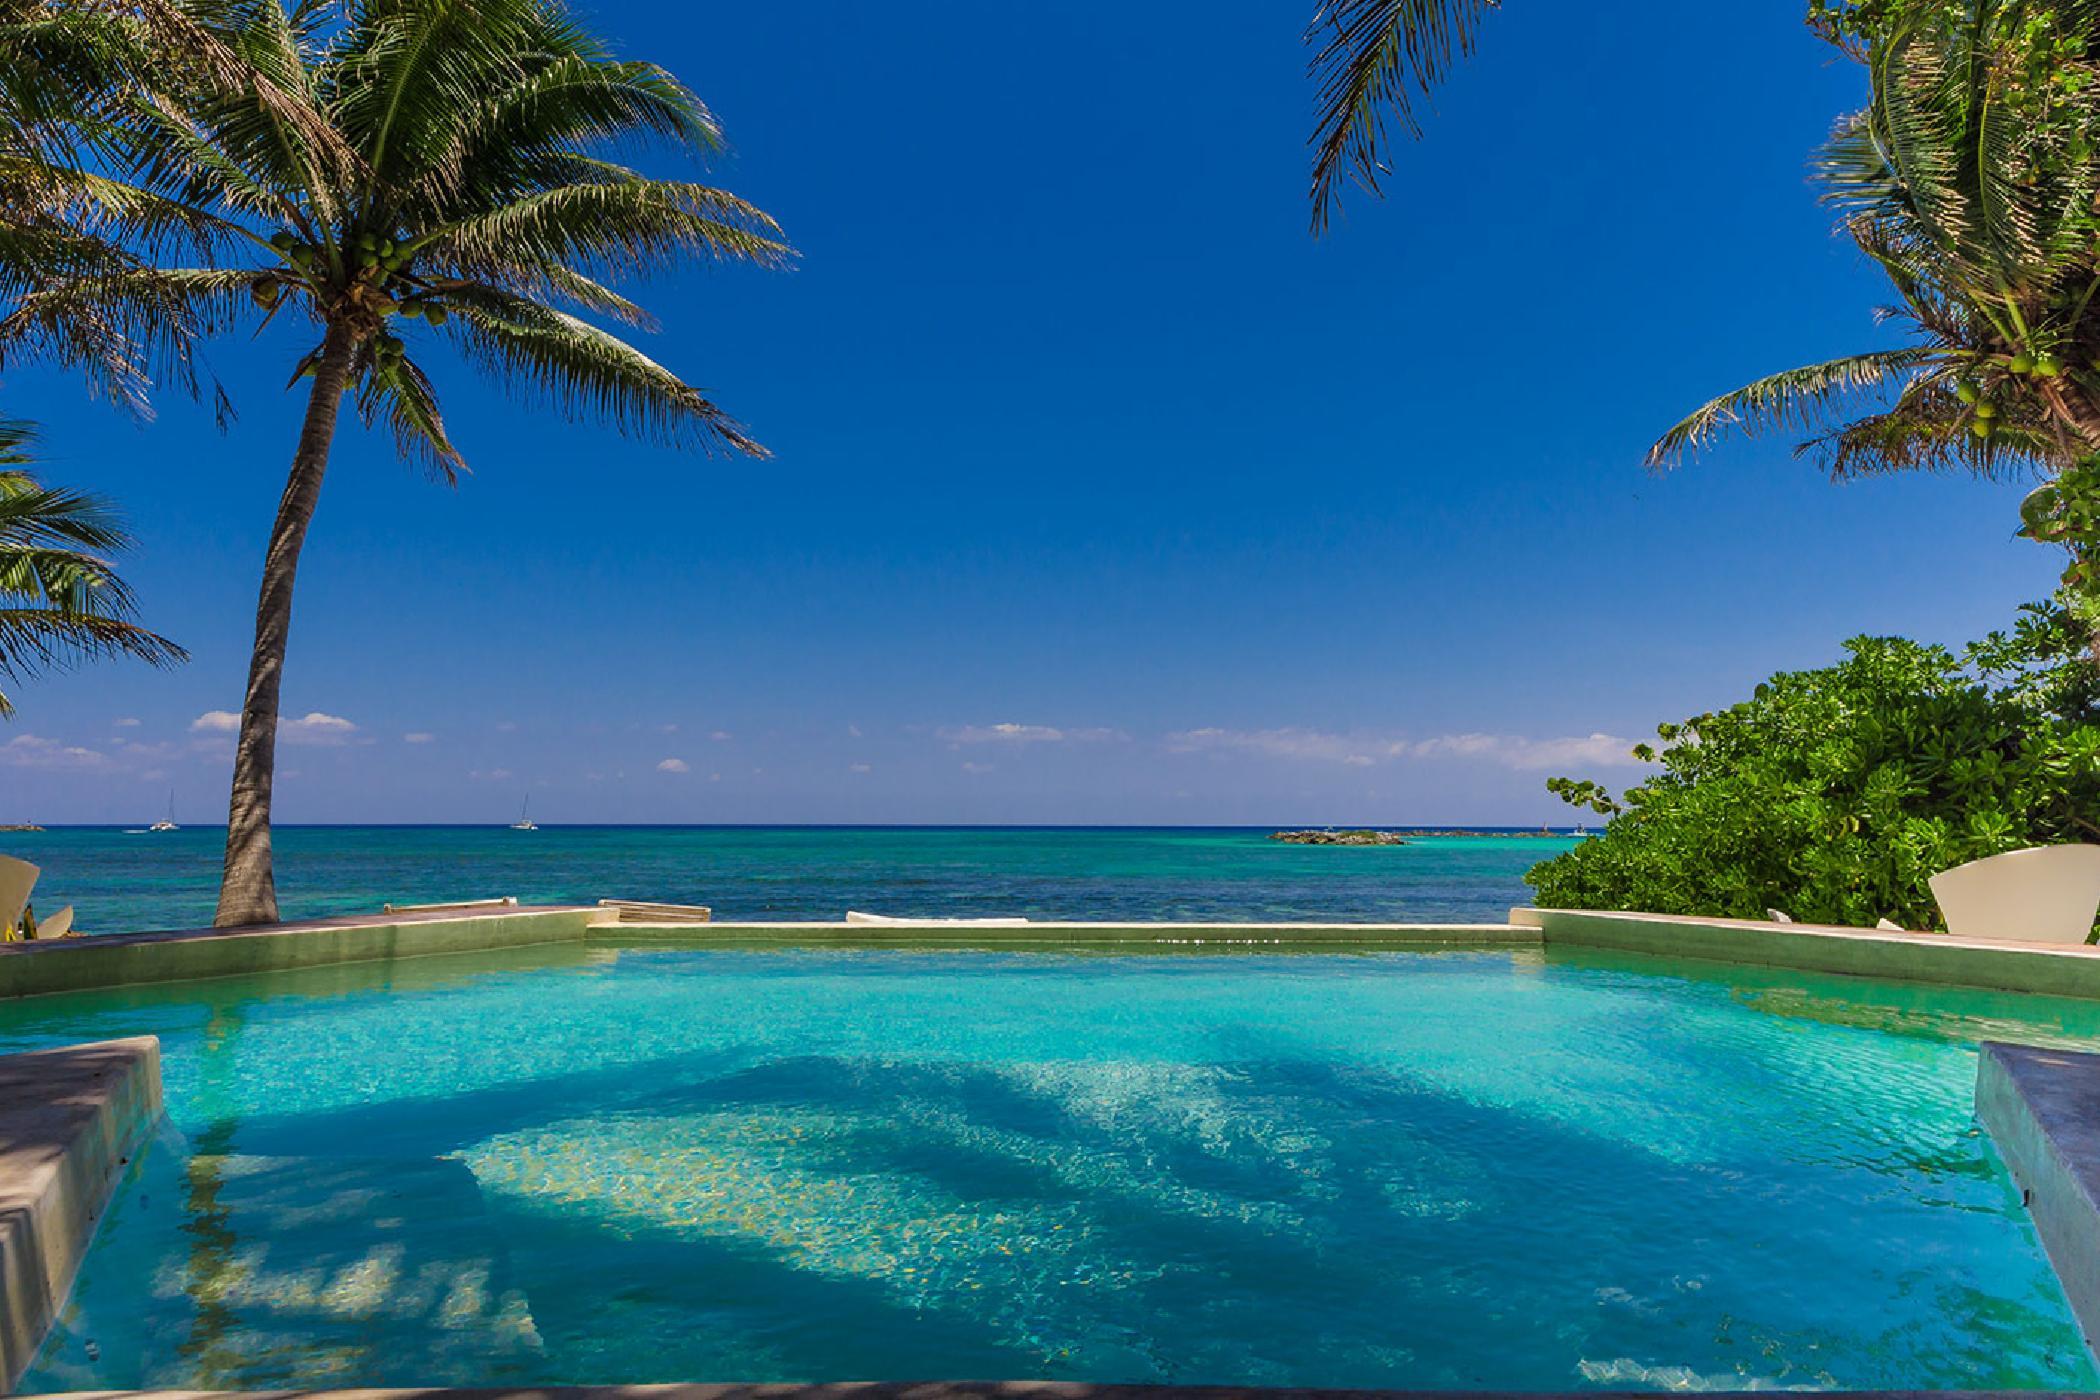 Maya_Luxe_Riviera_Maya_Luxury_Villas_Experiences_Puerto_Aventuras_5_Bedrooms_Zacil_Na_3.jpg